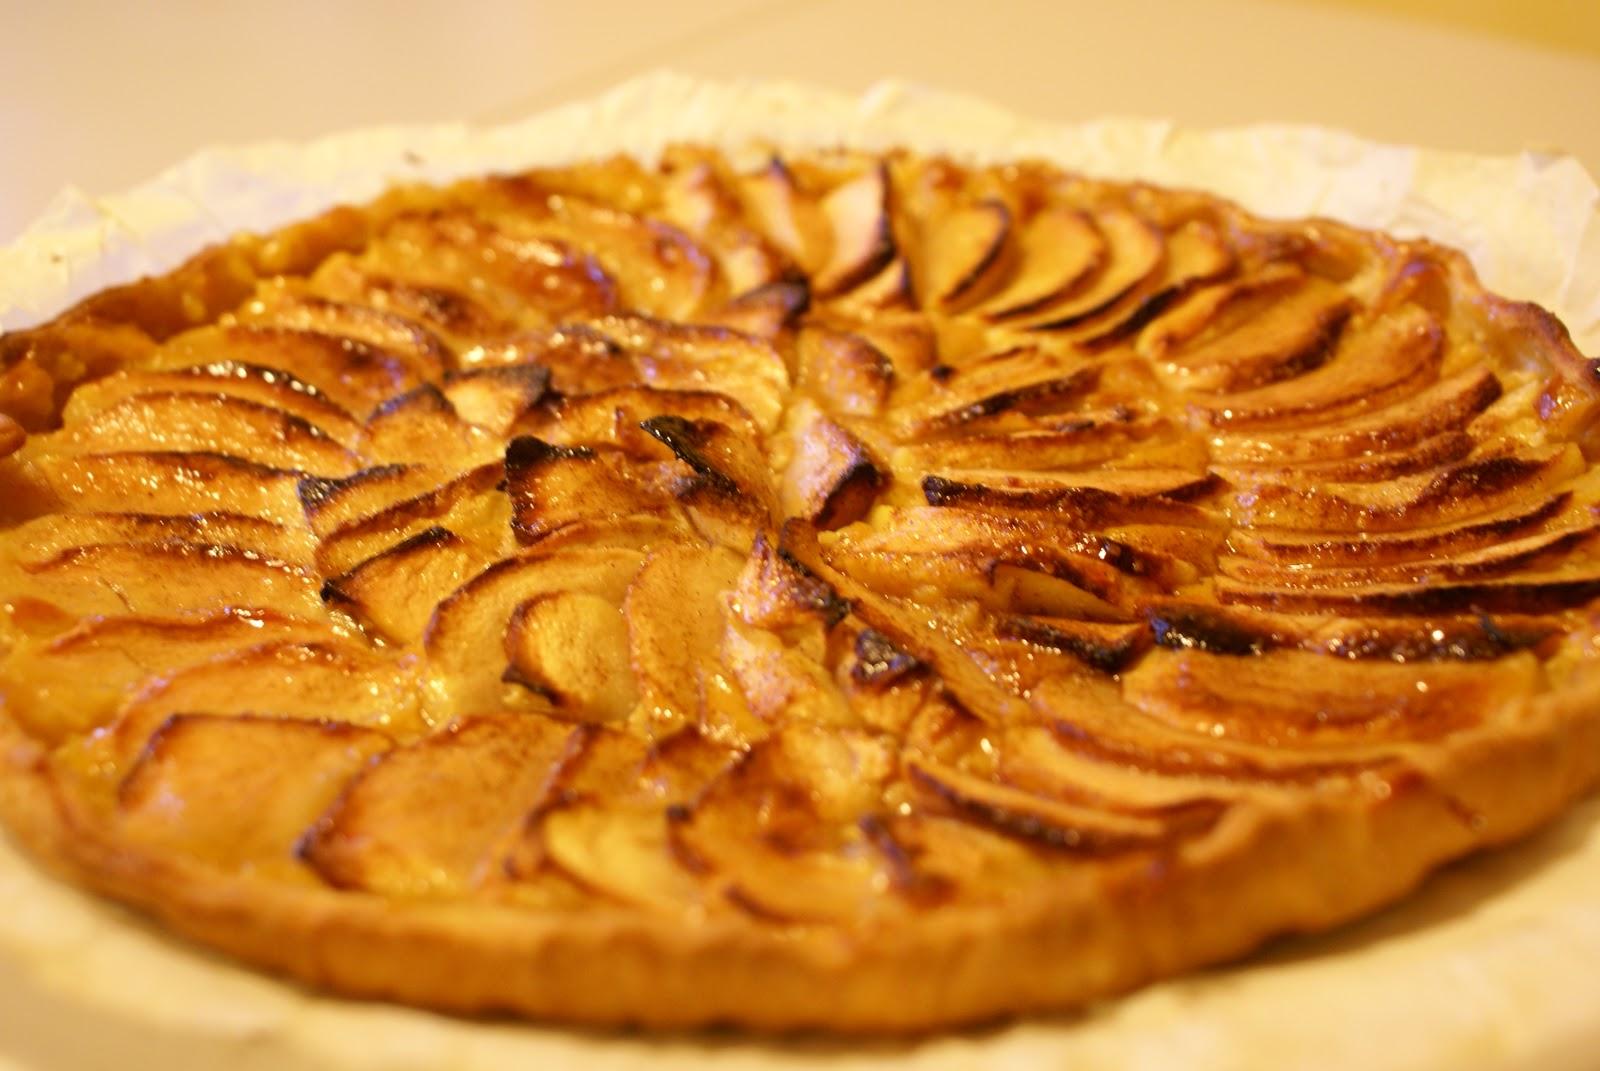 les recettes du sylvabar tarte aux pommes cr me p tissi re rapide. Black Bedroom Furniture Sets. Home Design Ideas